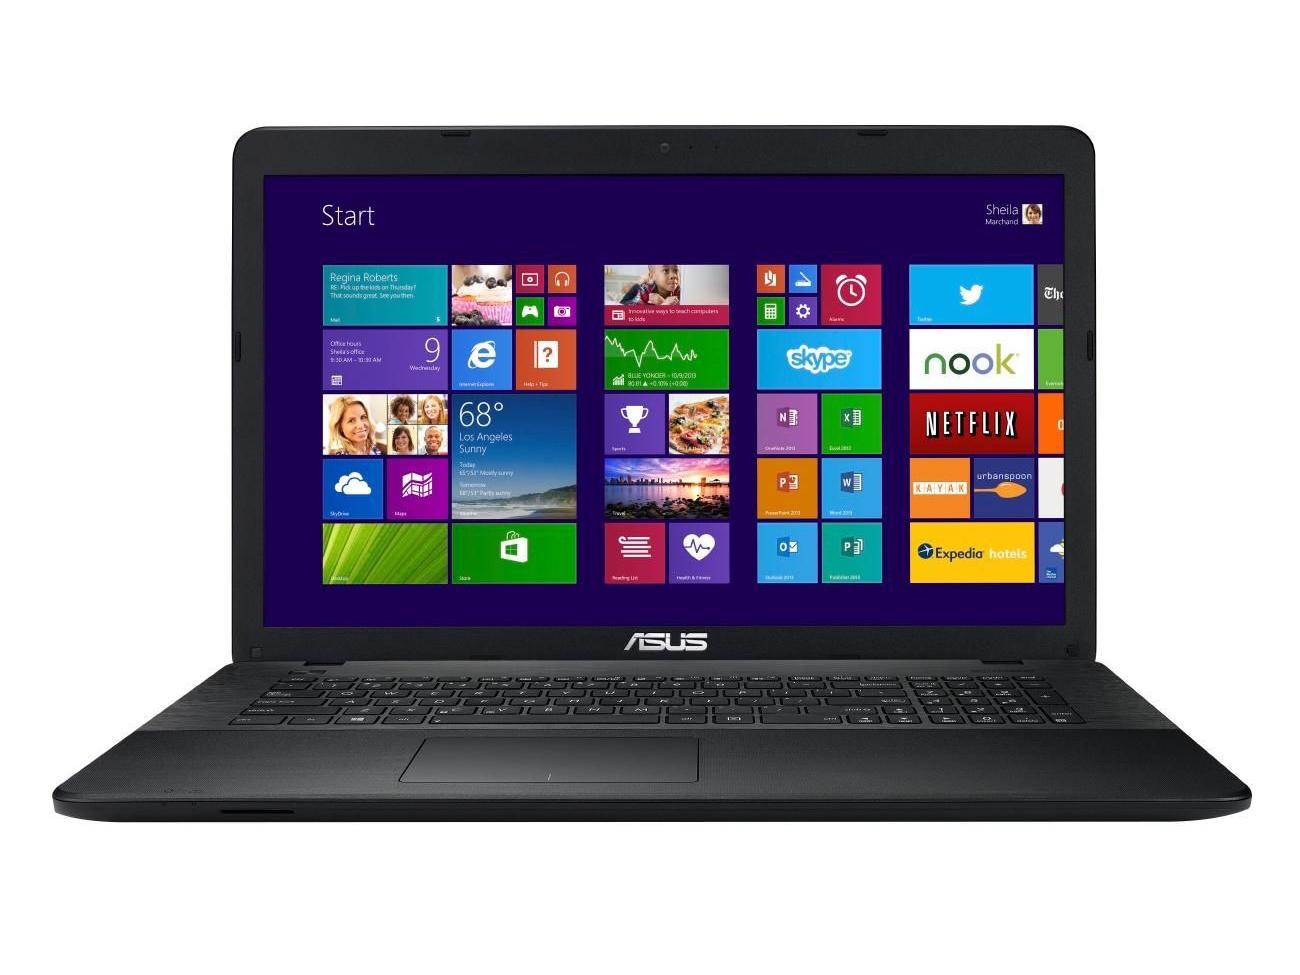 ASUS X751MA Broadcom WLAN Drivers for Windows 7